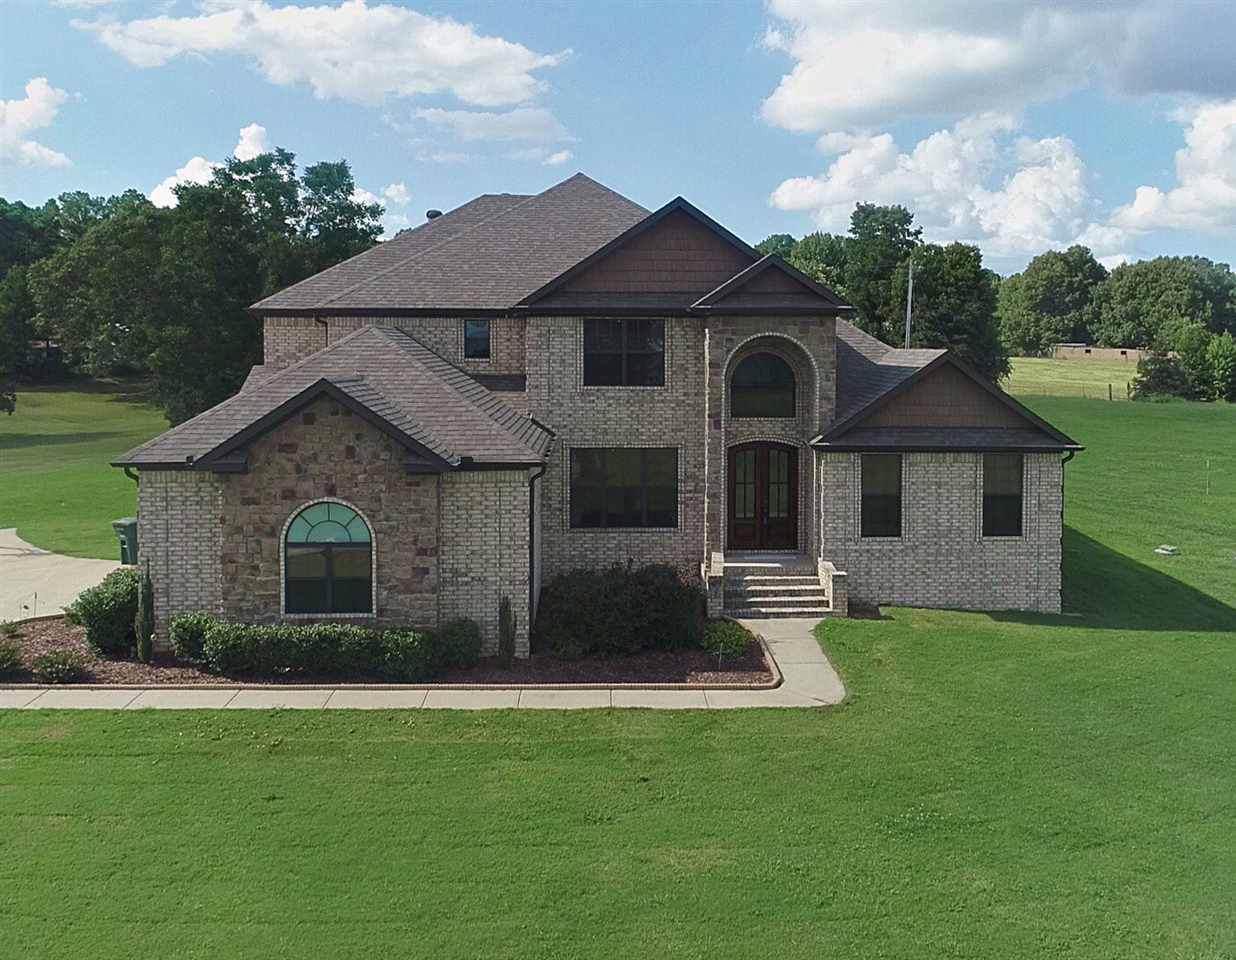 42 Cr 7802 Road, Jonesboro, AR 72401 (MLS #10076617) :: Halsey Thrasher Harpole Real Estate Group